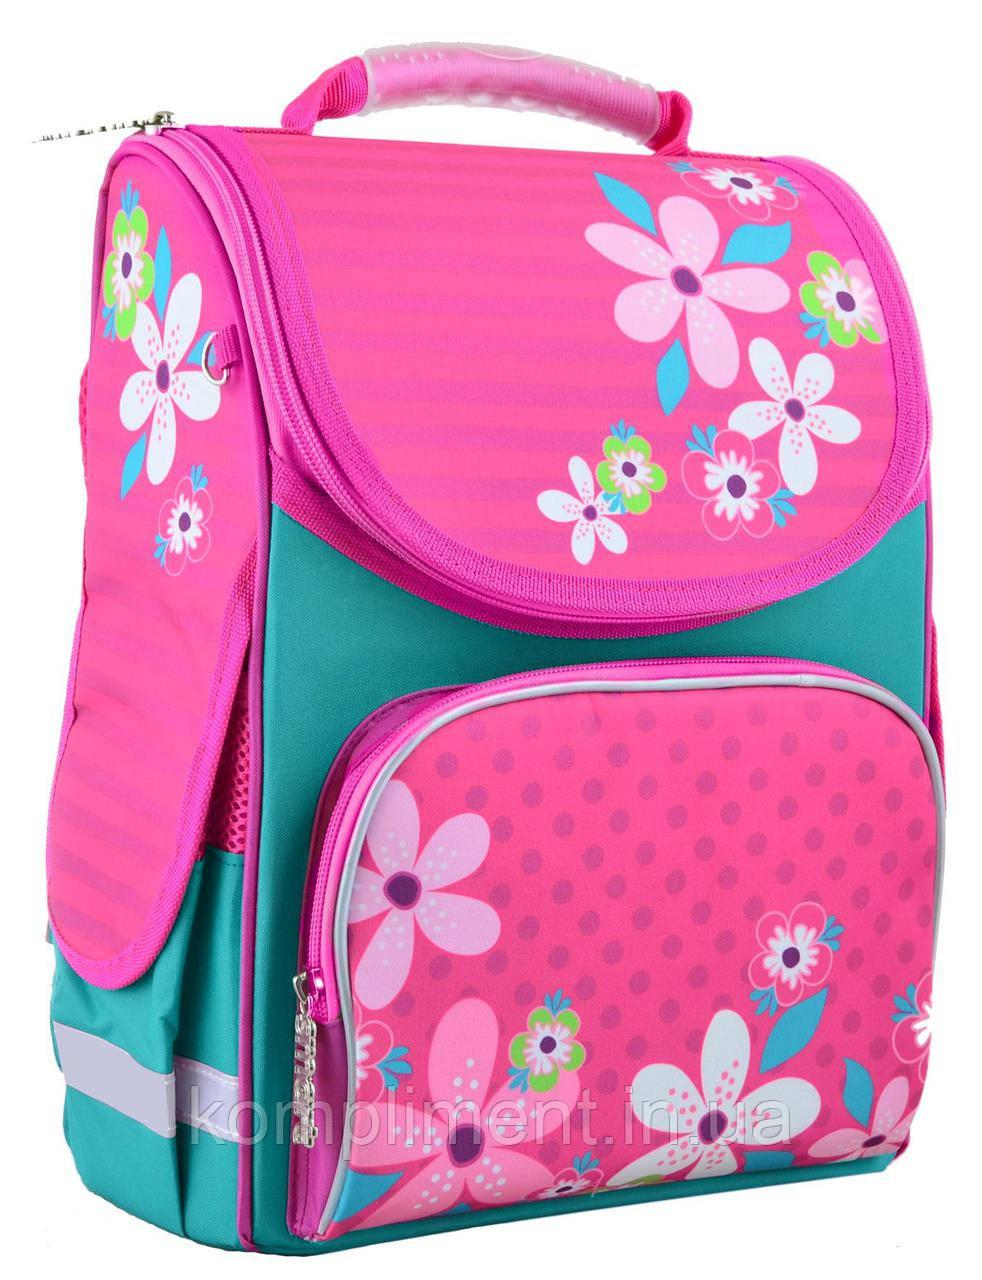 Рюкзак каркасний PG-11 pink Flowers 31*26*14 , SMART